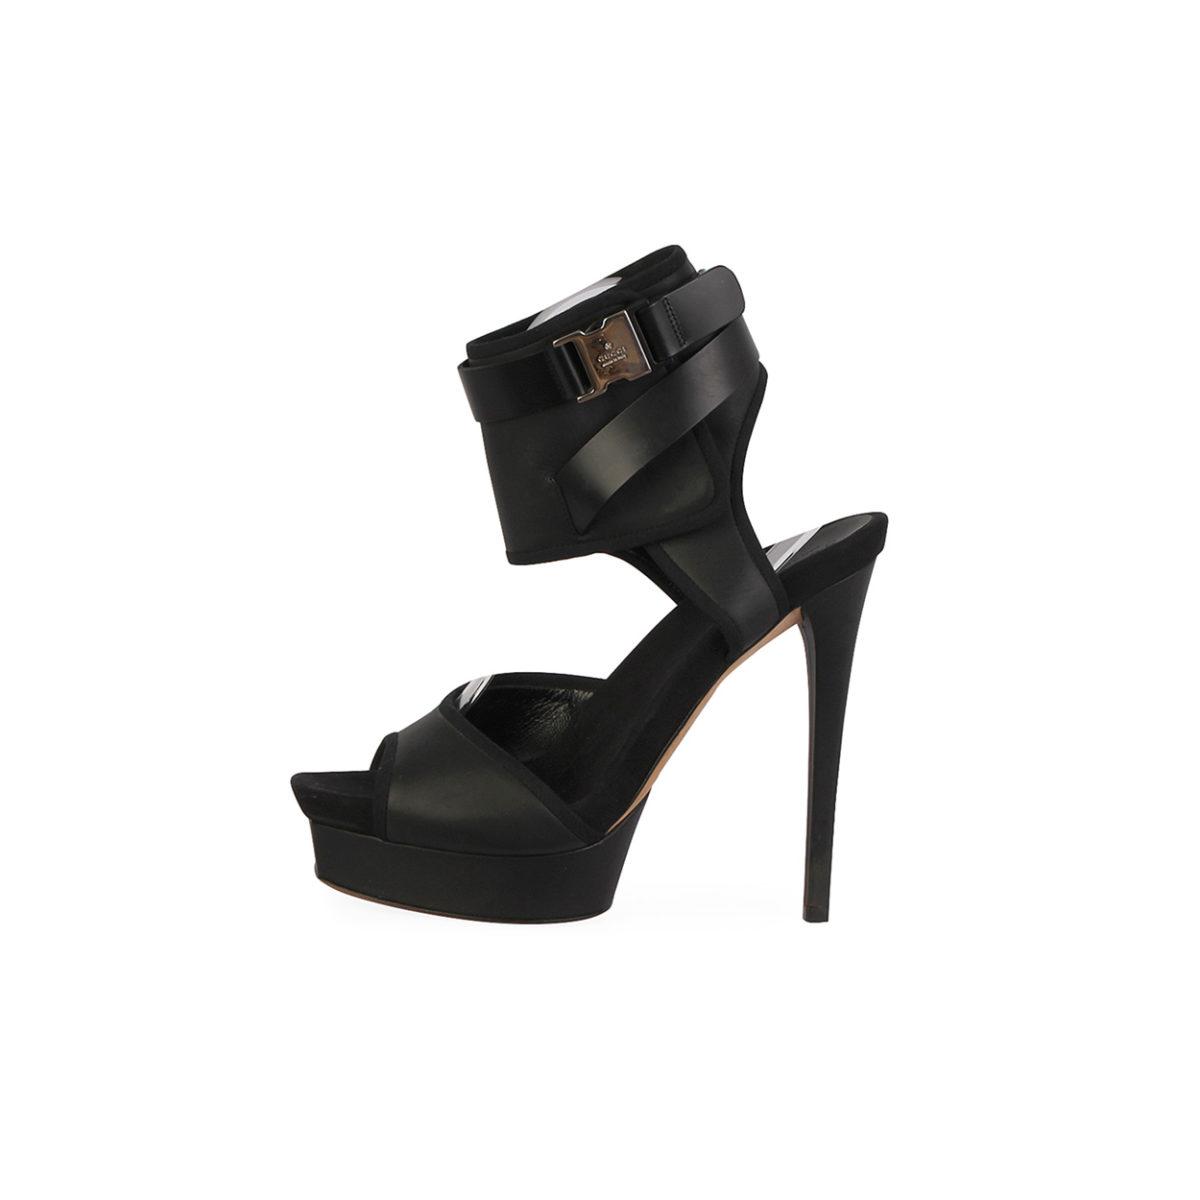 51664fd59b0 GUCCI Leather Gail Ankle Wrap Platforms Sandals Black – S  39.5 (6 ...